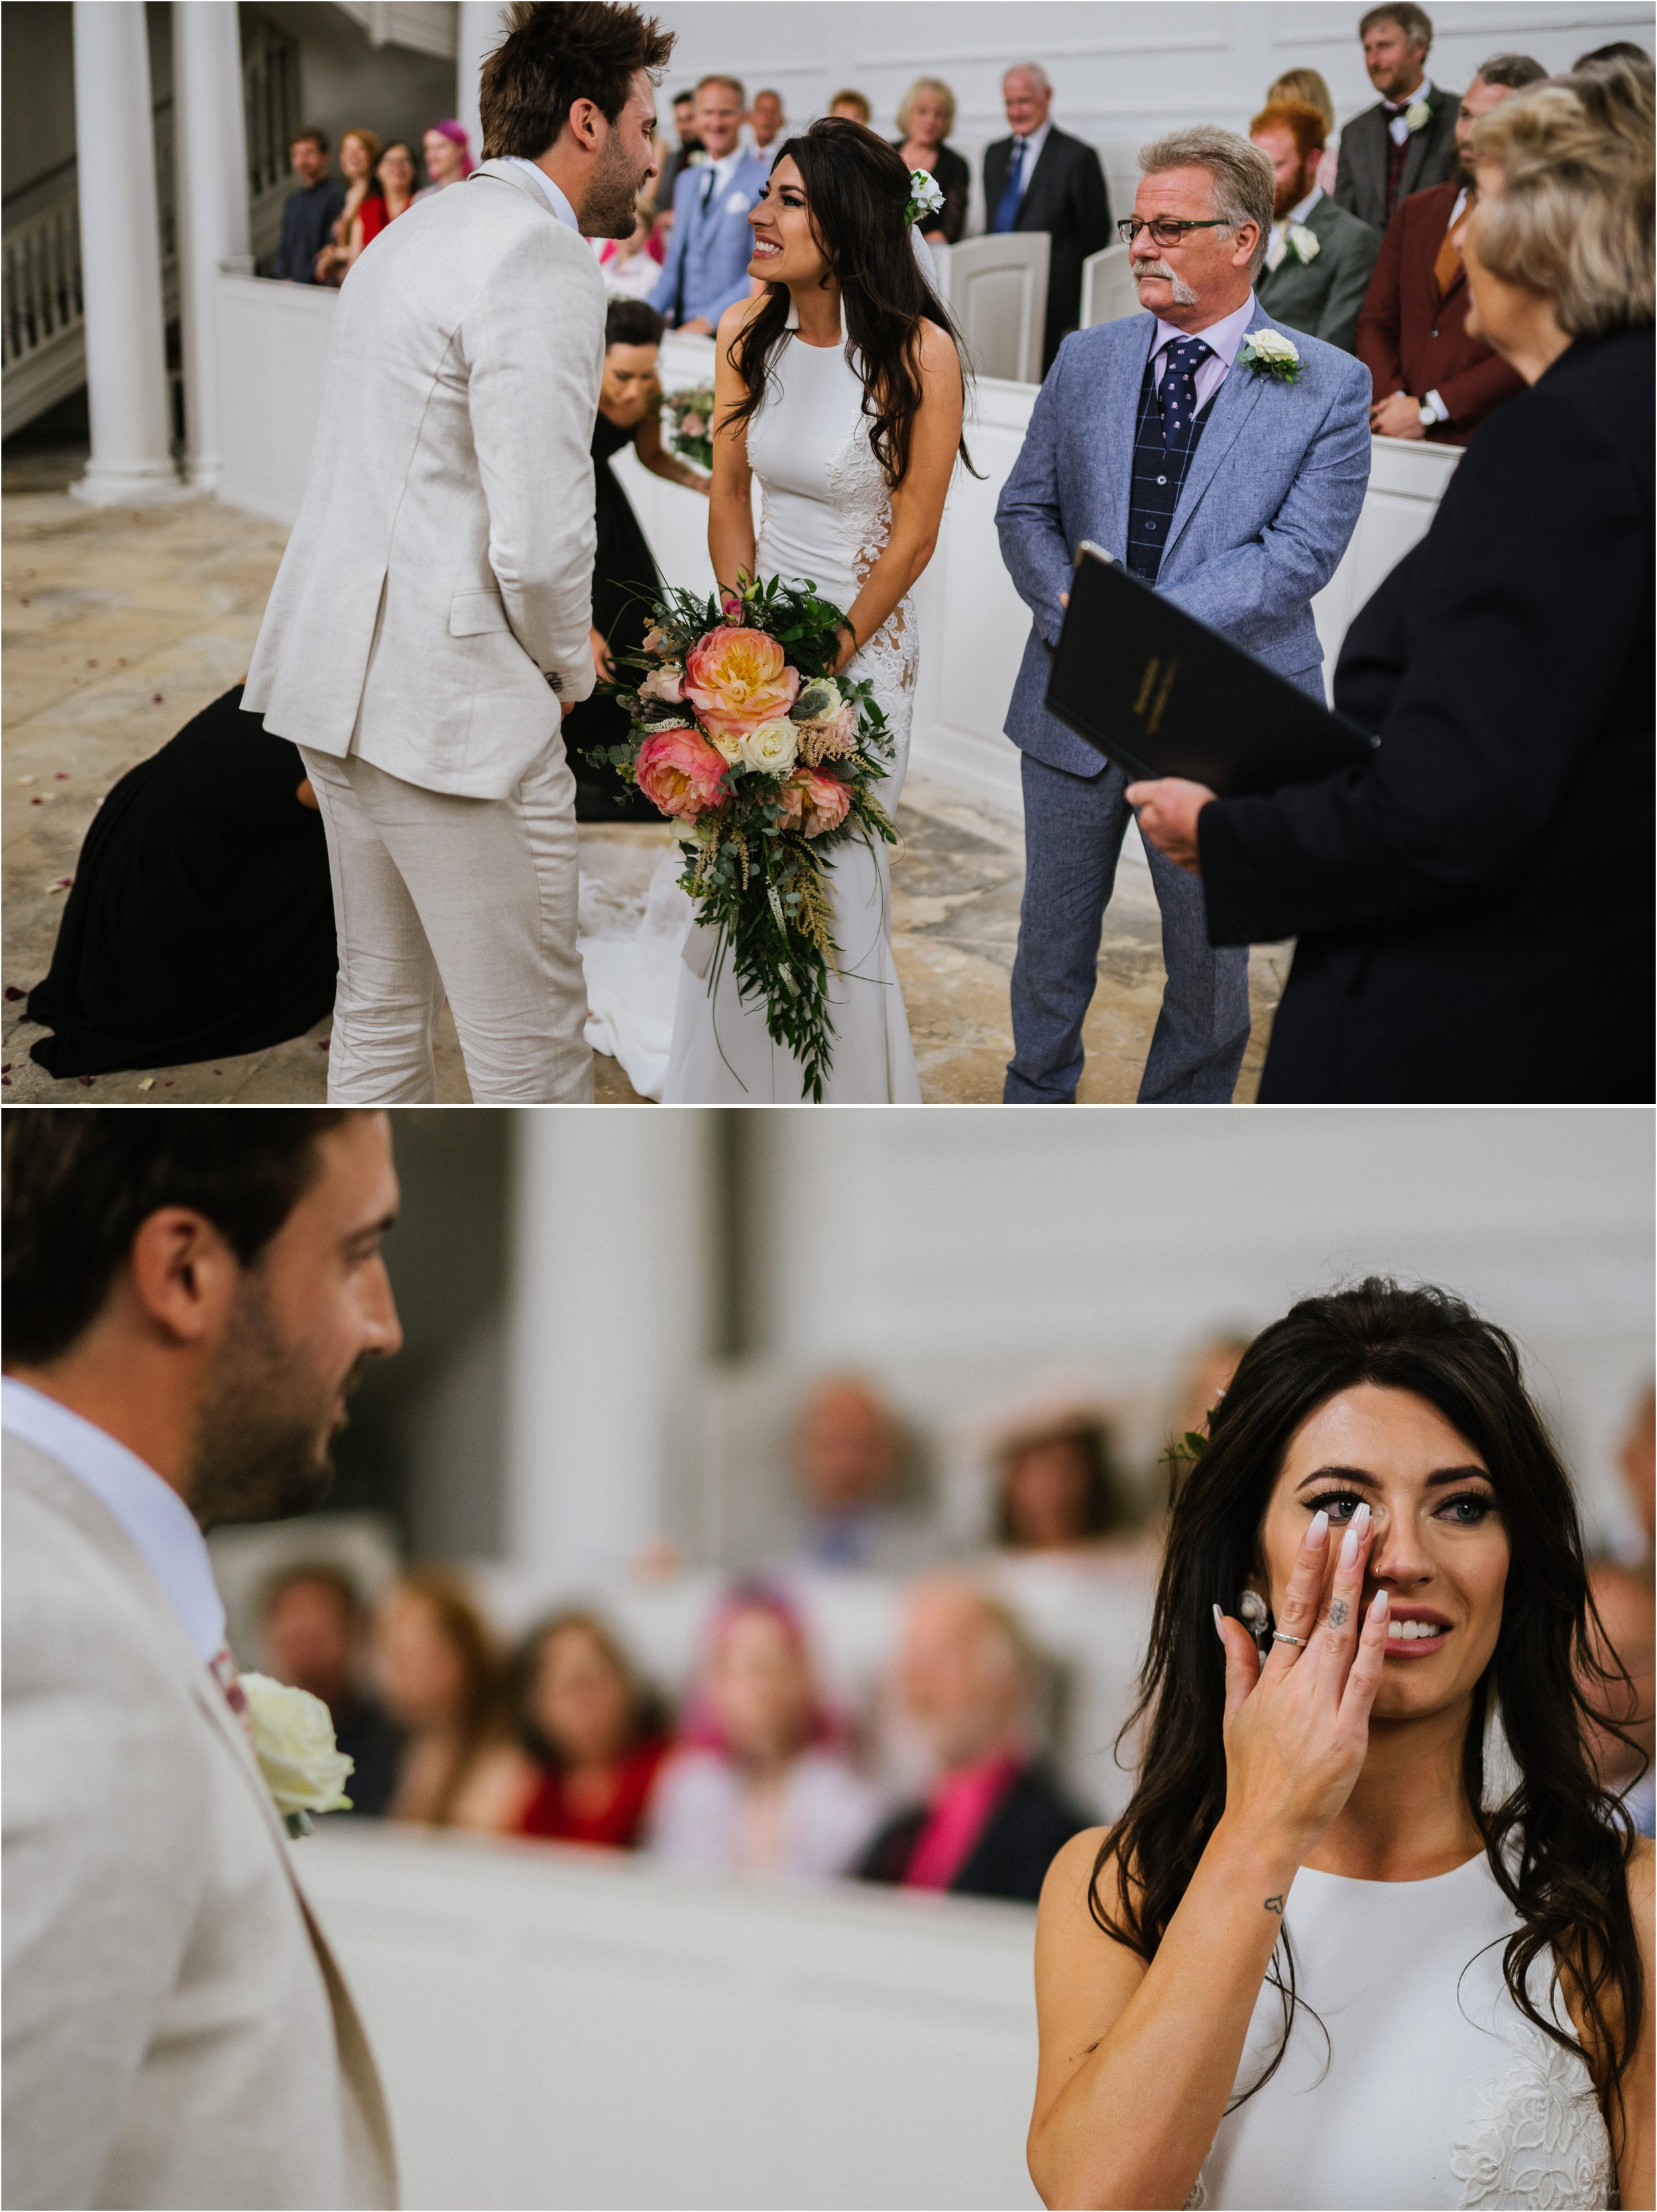 Compton Verney wedding photography_0054.jpg